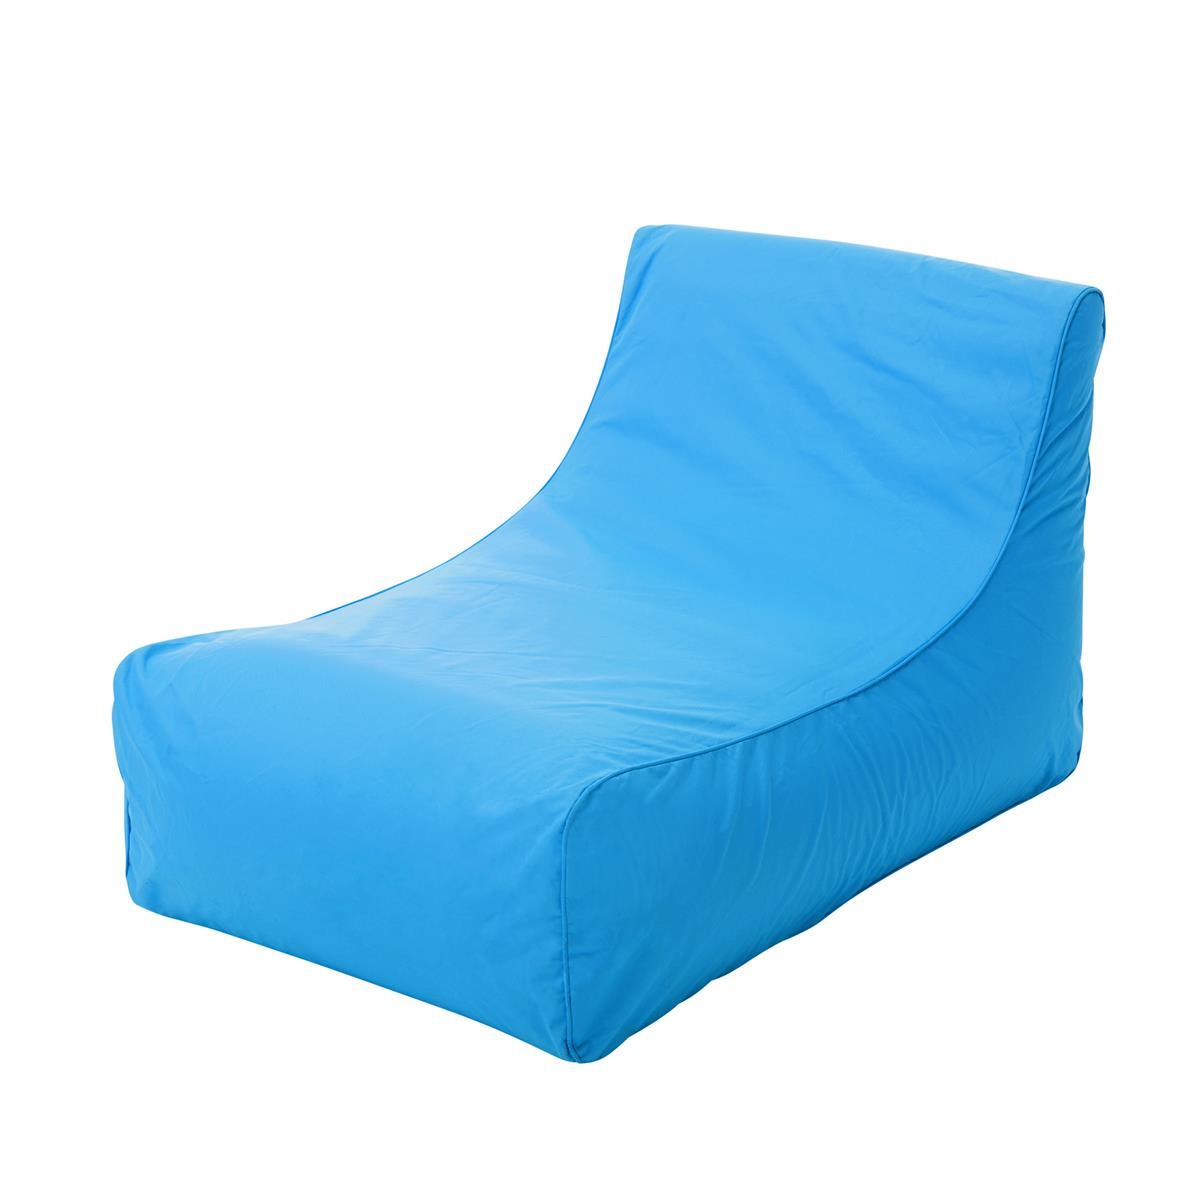 sitzsack poolliege blau outdoor garten vladon m bel. Black Bedroom Furniture Sets. Home Design Ideas